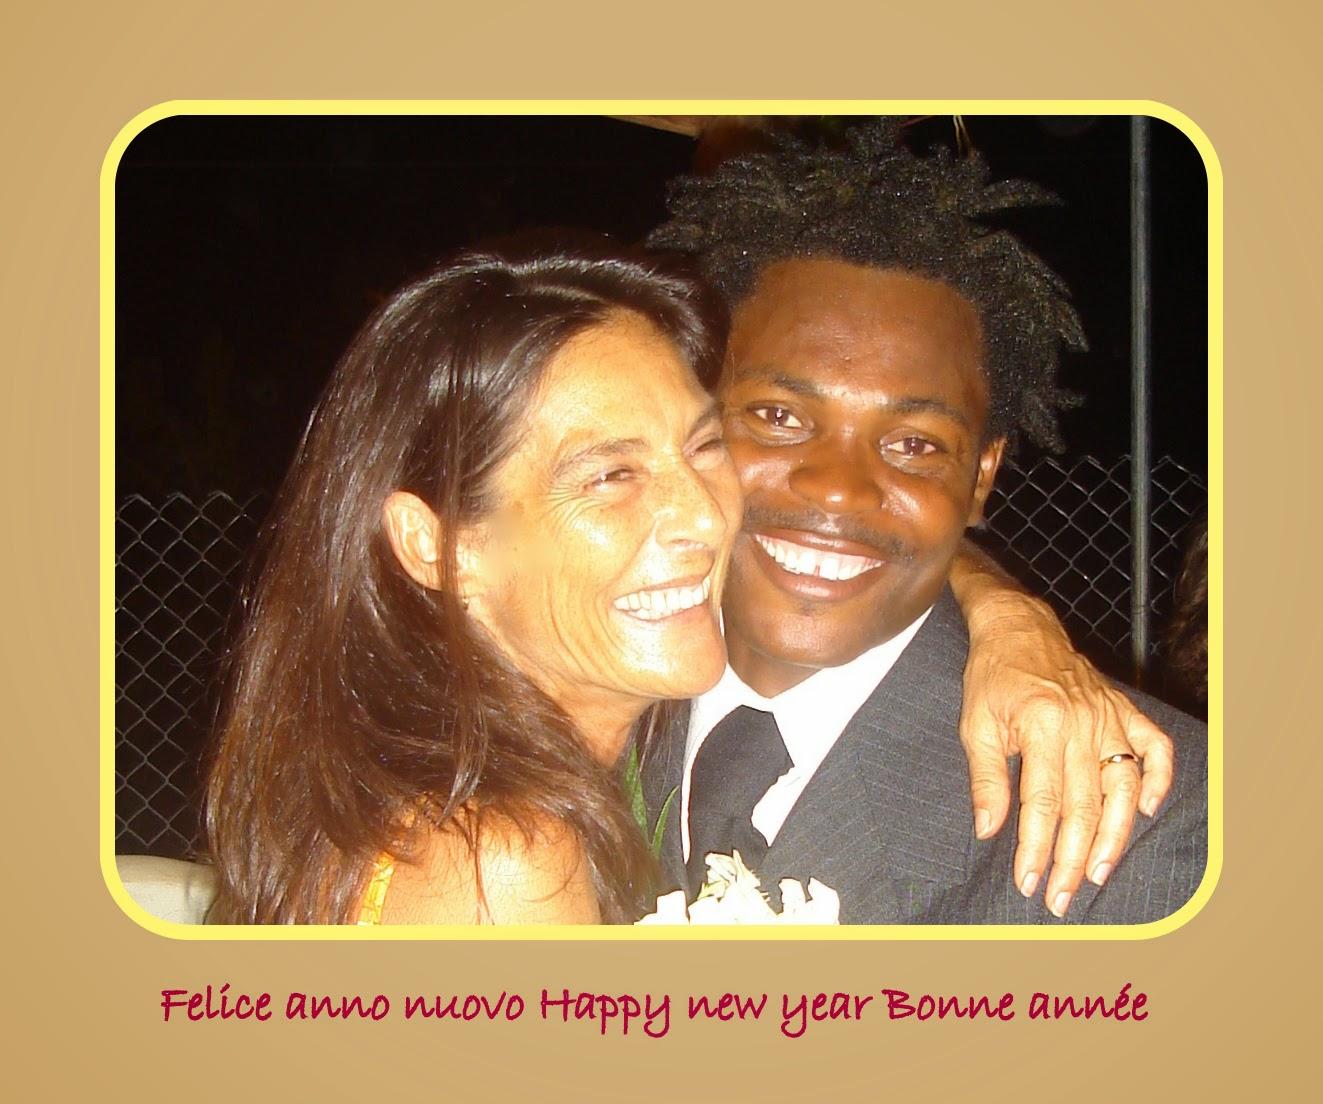 Haitianarts gift shop felice anno nuovo